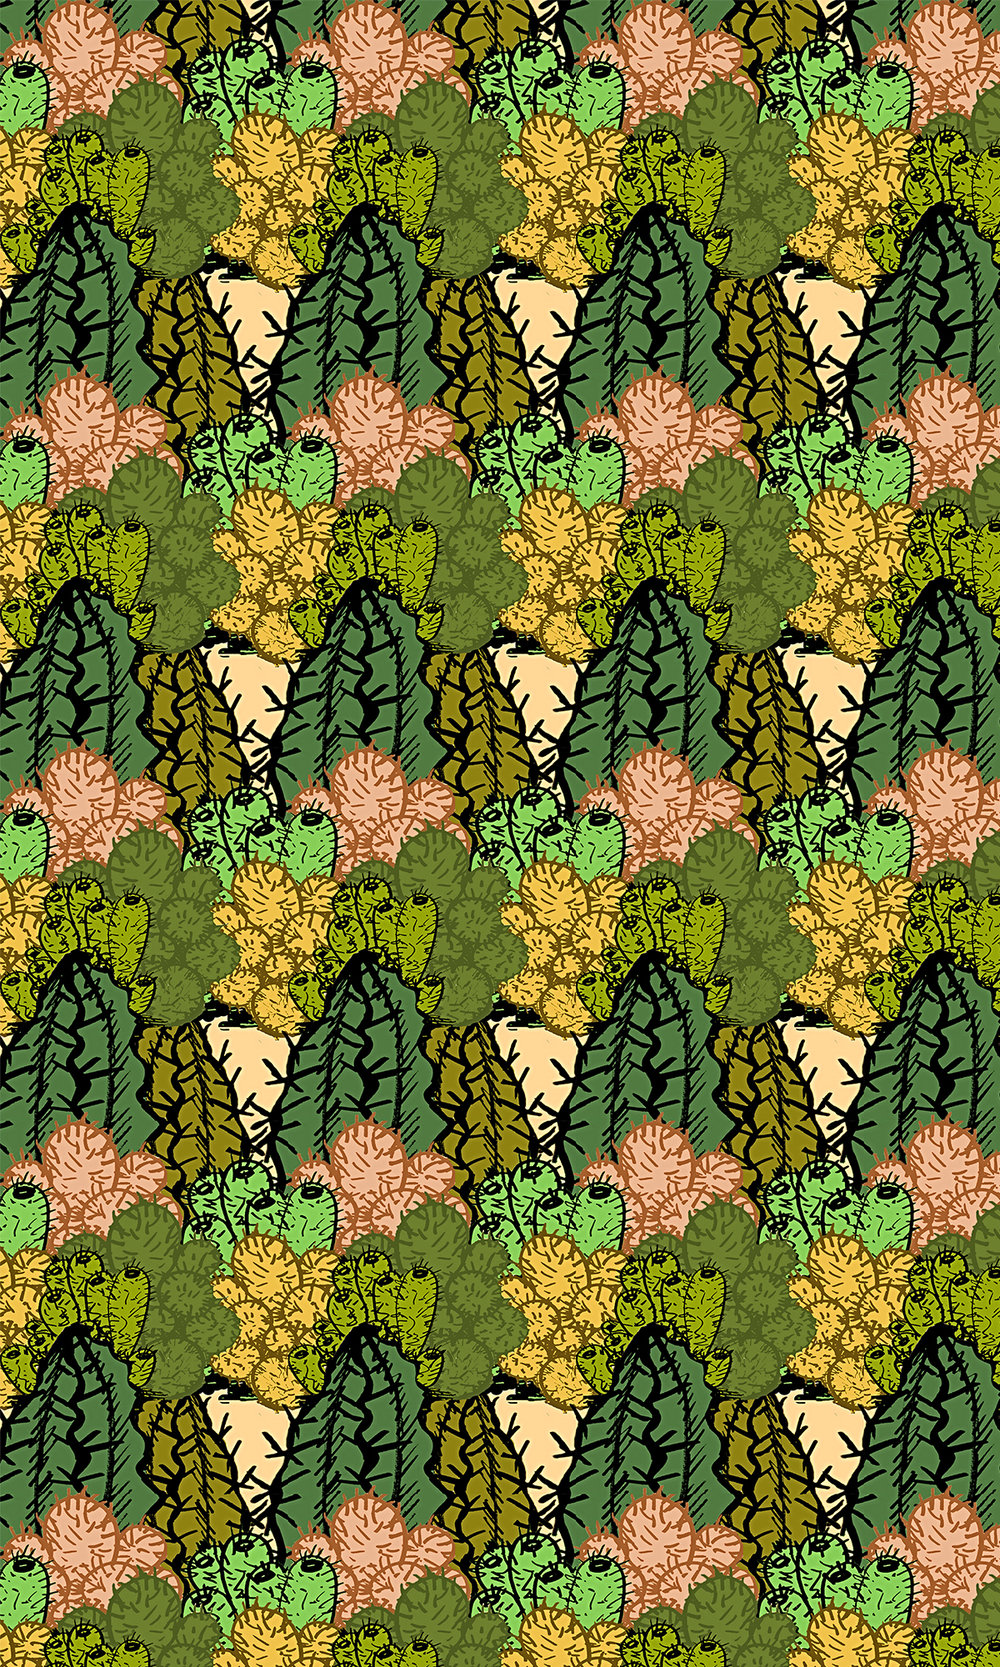 cactiprints.jpg